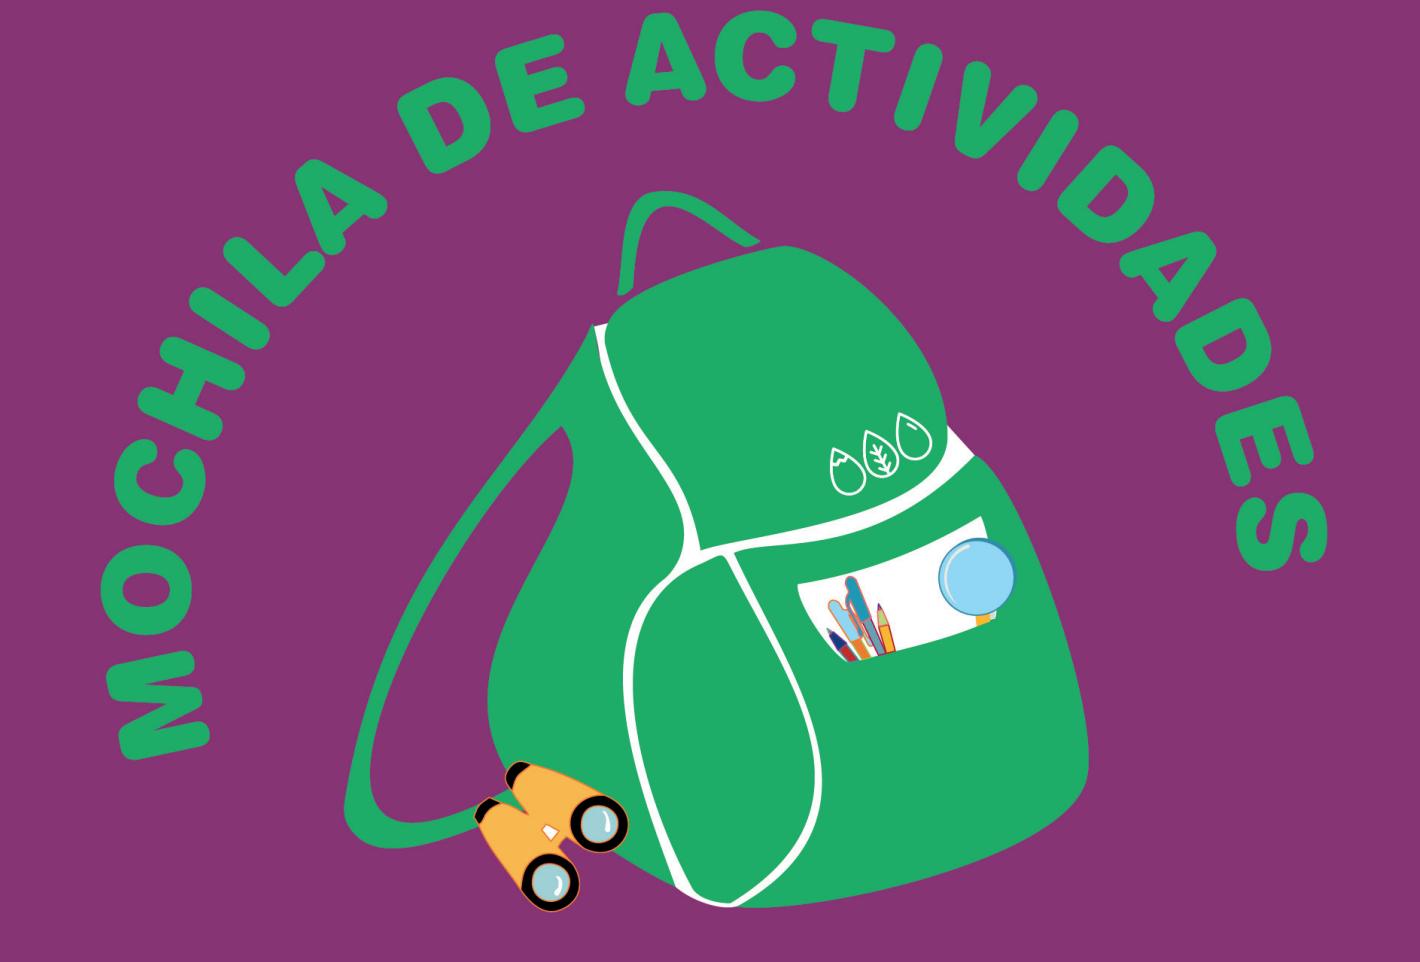 Diciembre 2018: Mochila de actividades en espacios protegidos.